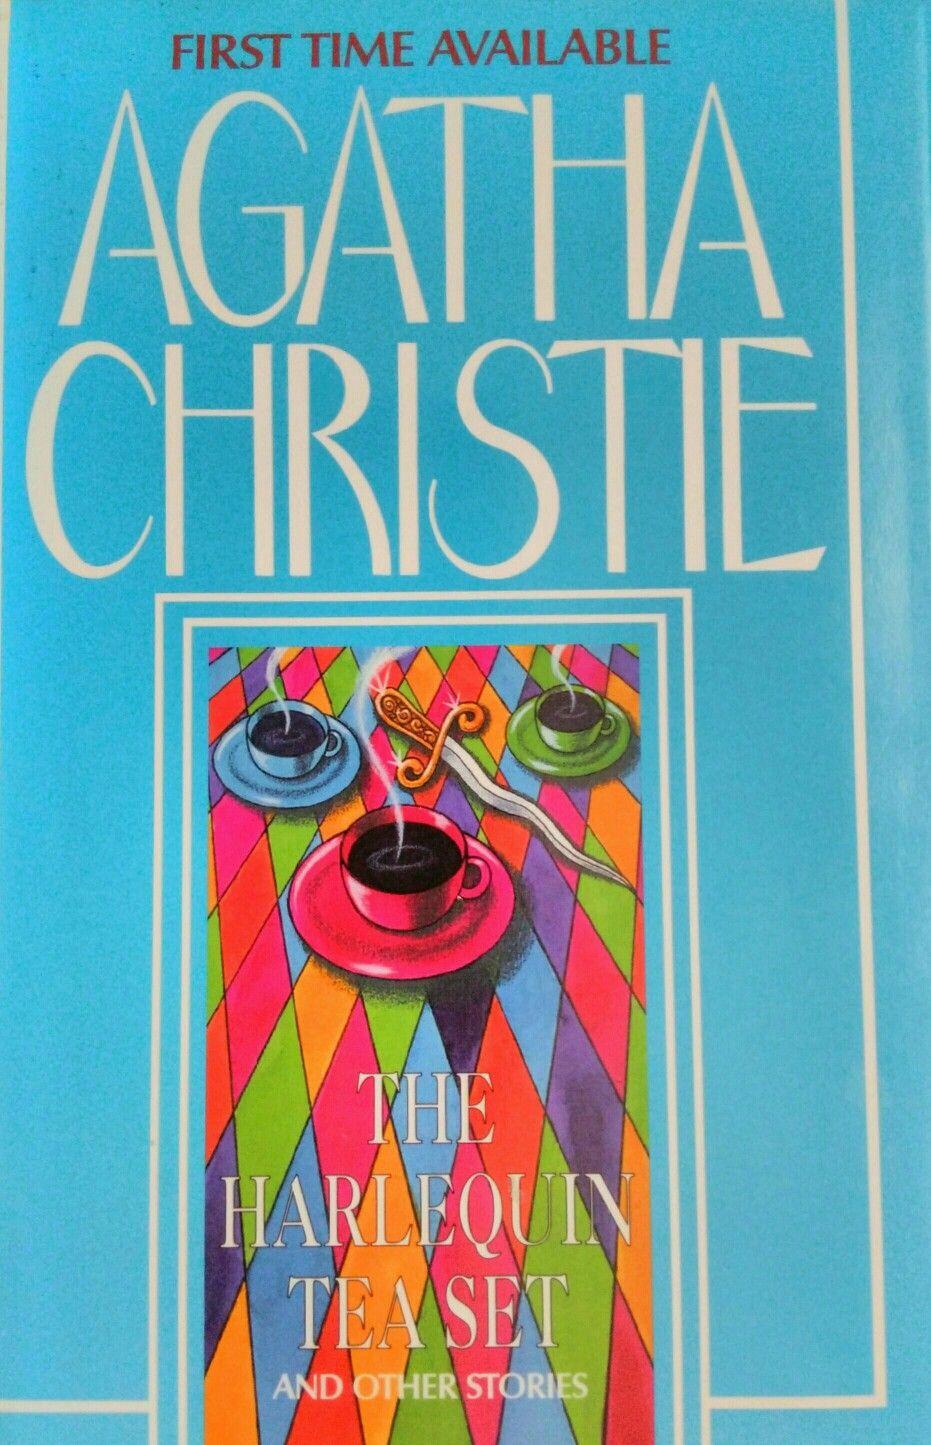 The Harlequin Tea Set by Agatha Christie.